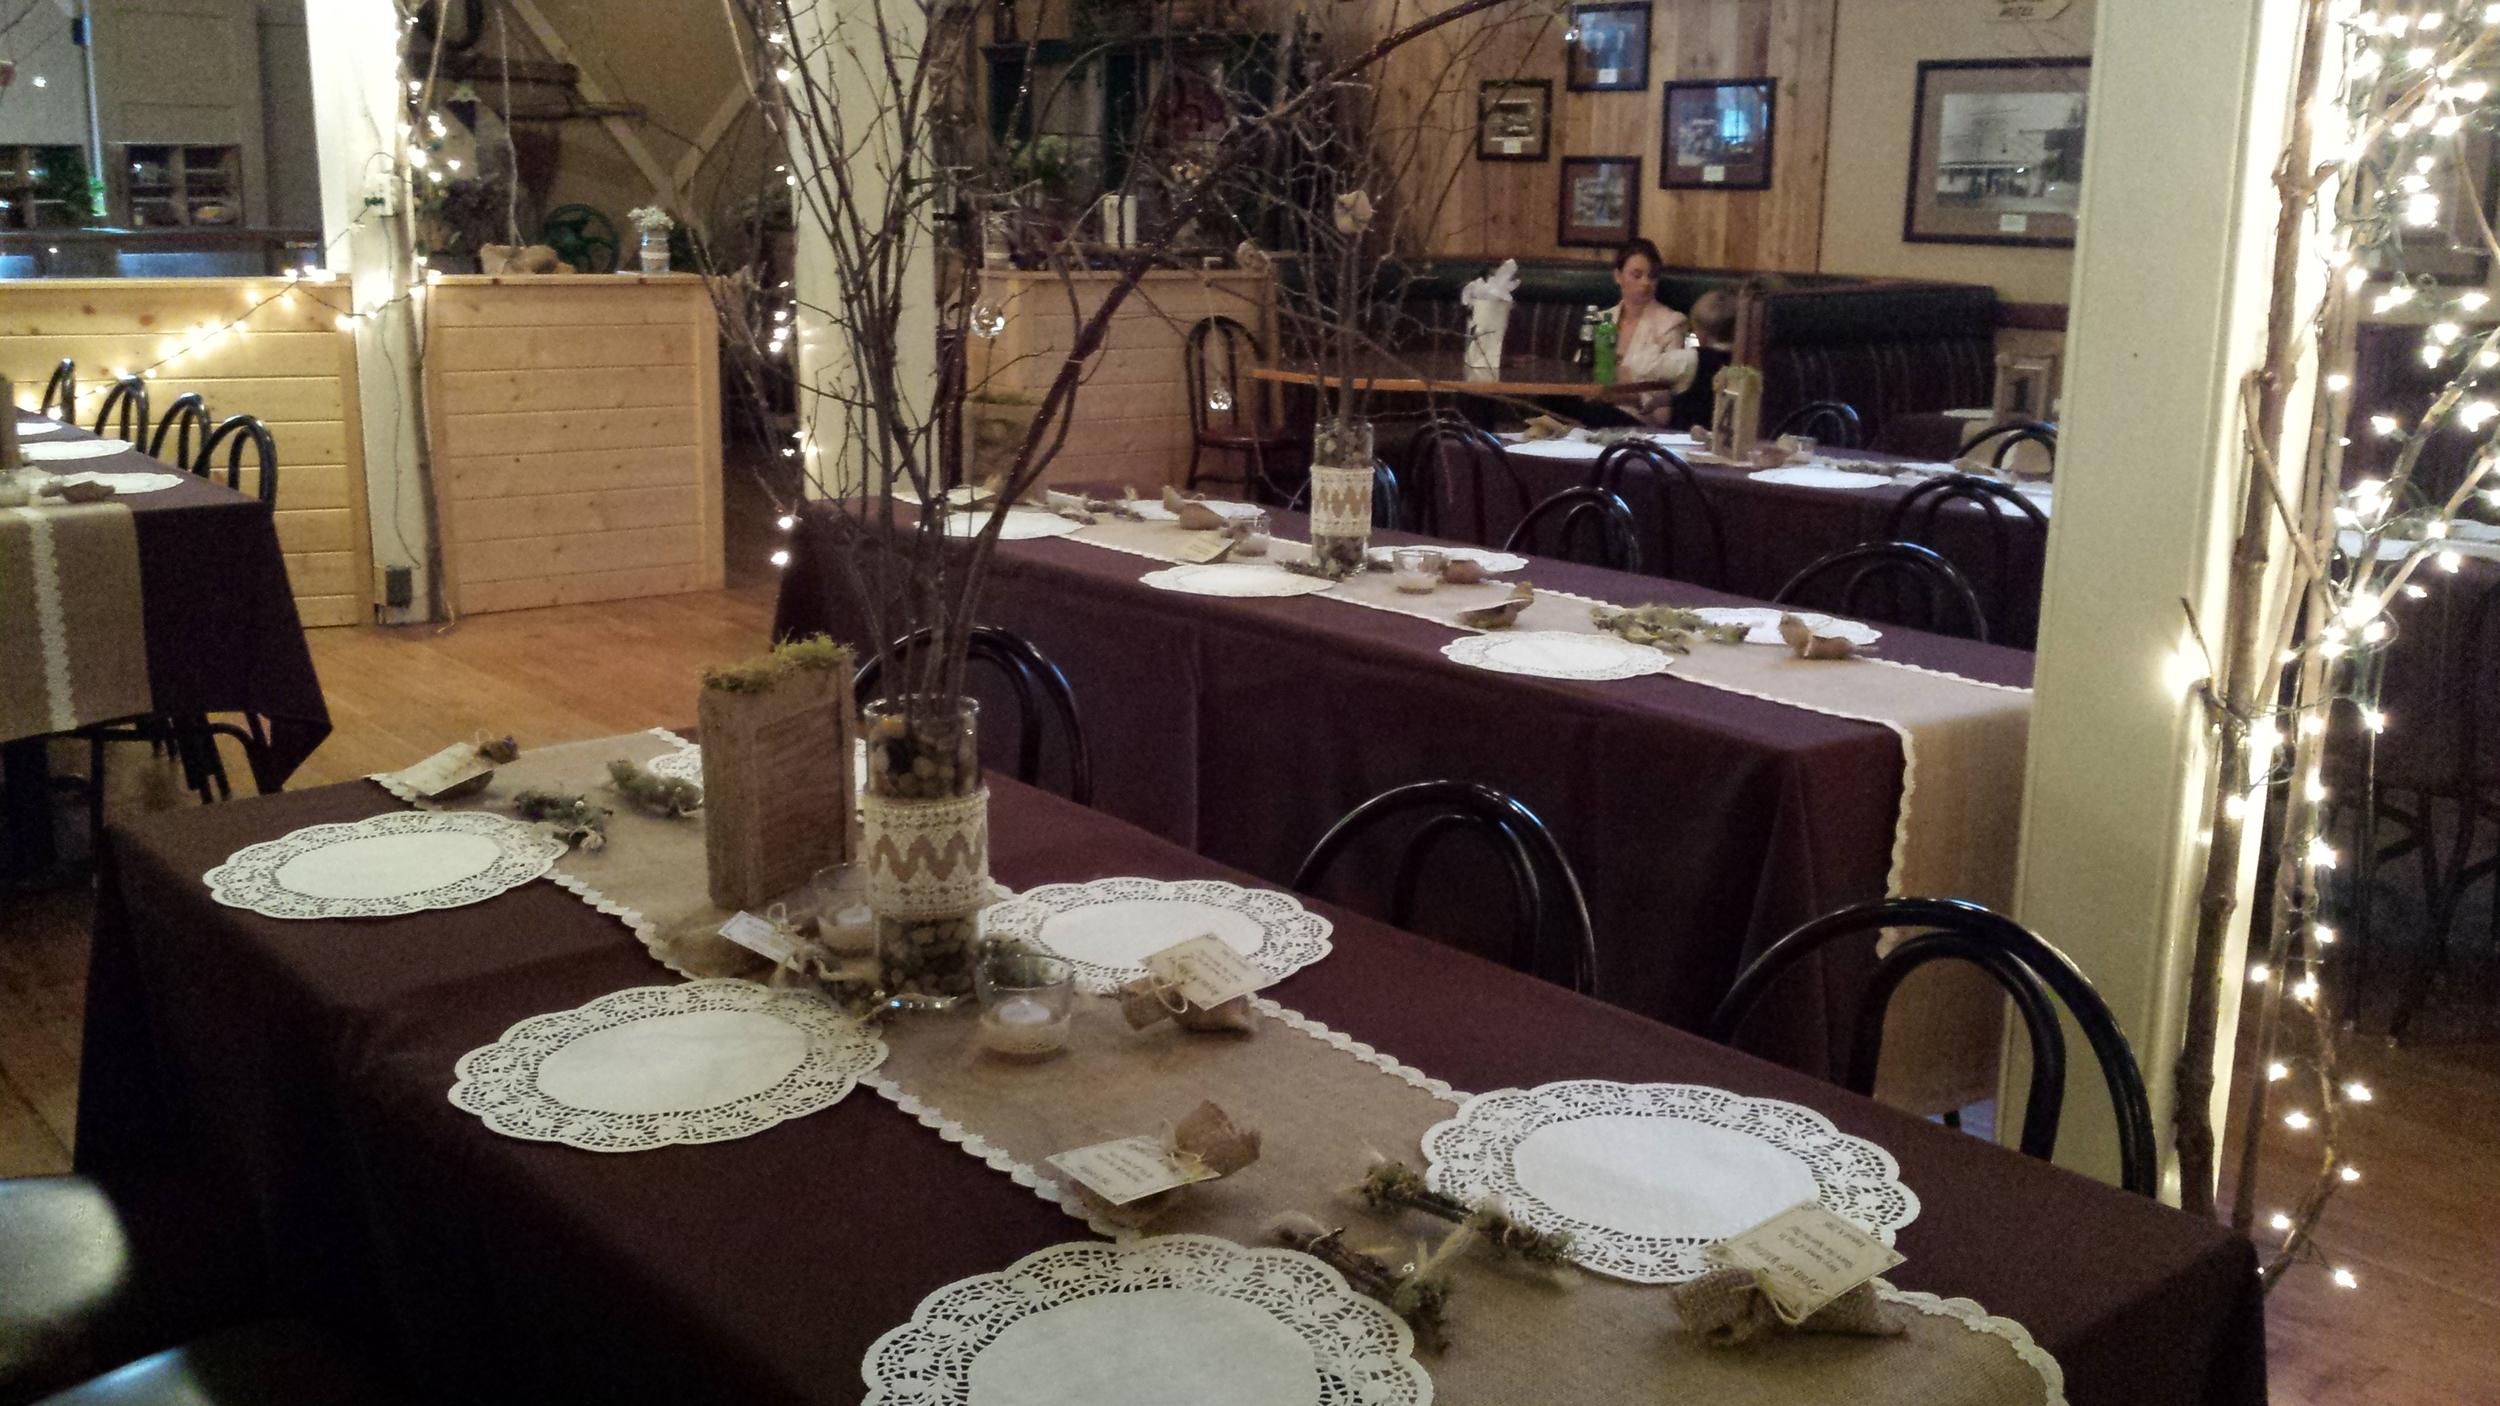 brown, 3 tables,tall vases - Copy.jpg